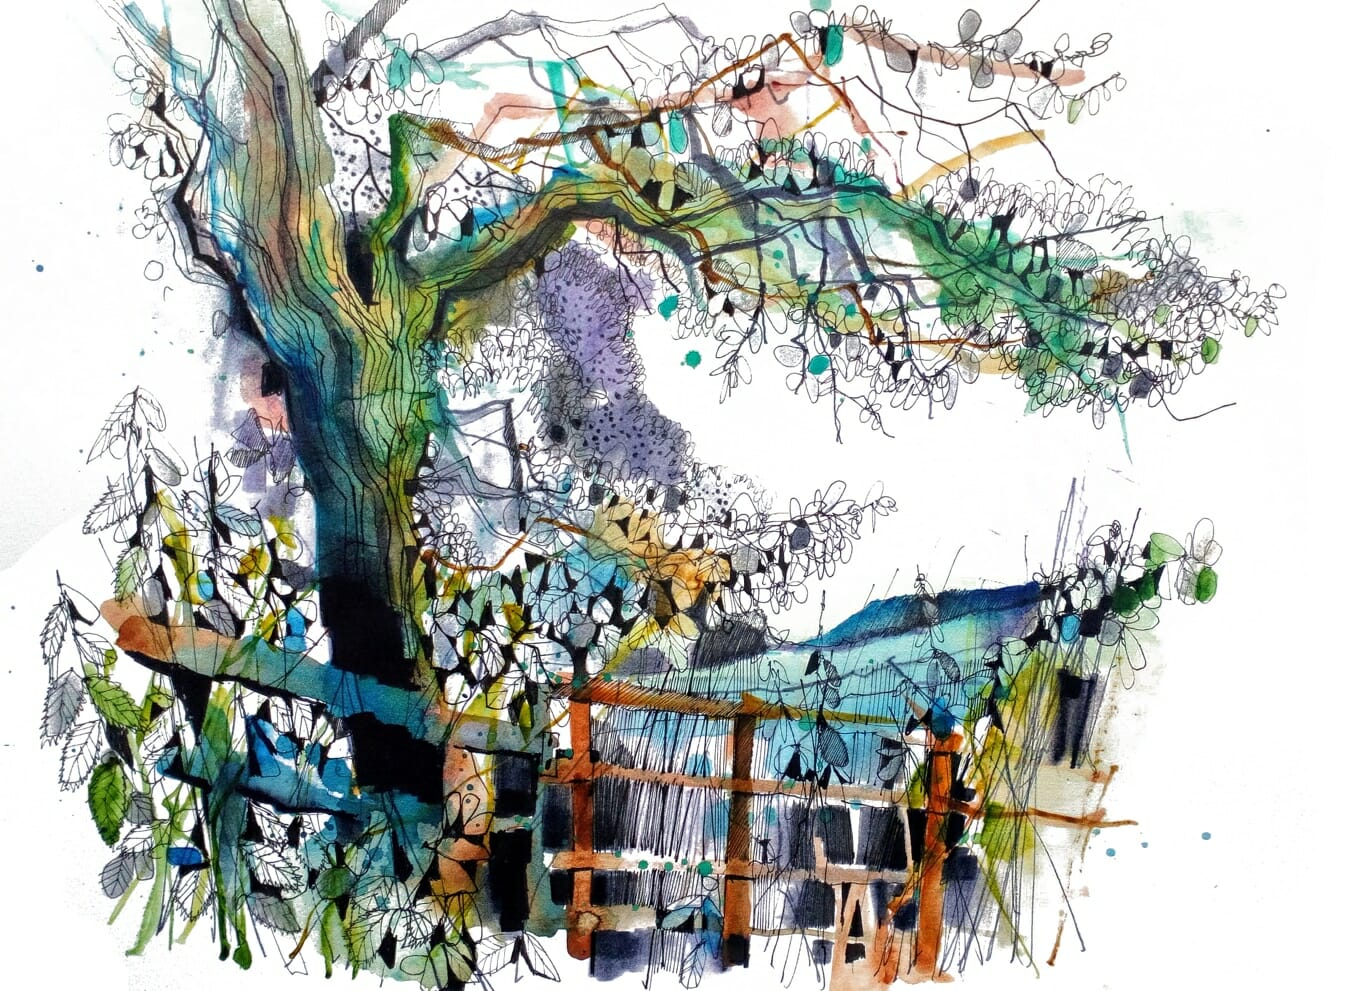 Broxton Garden by Ian Fennelly